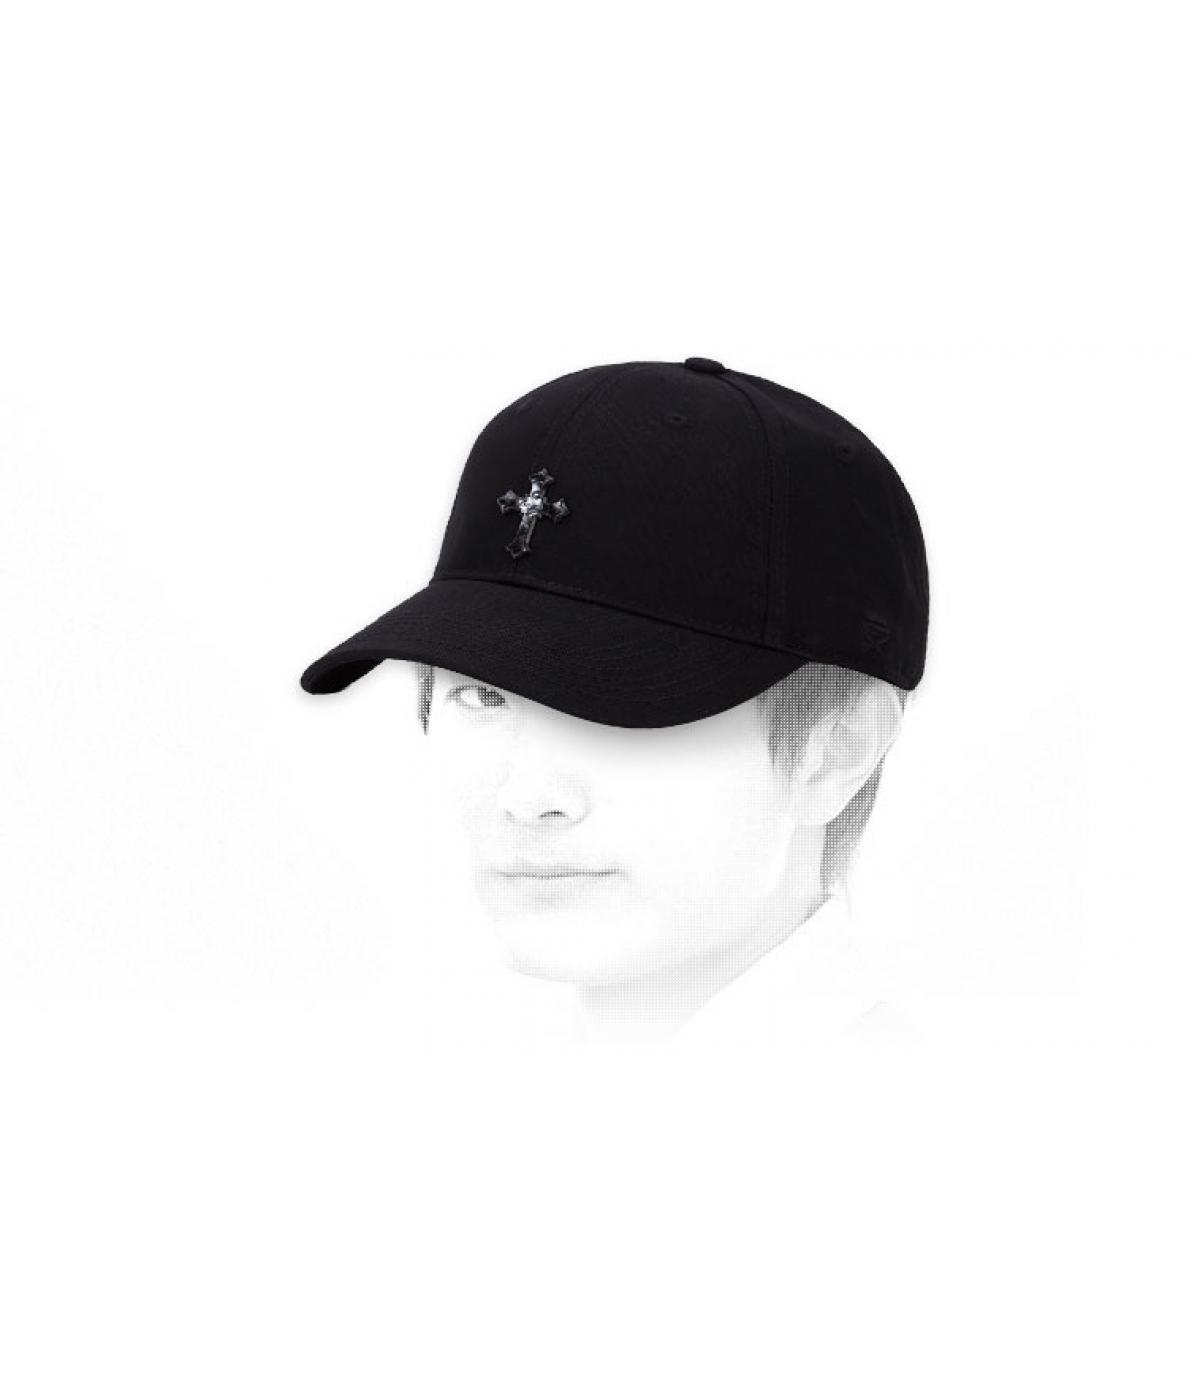 black Marley cap